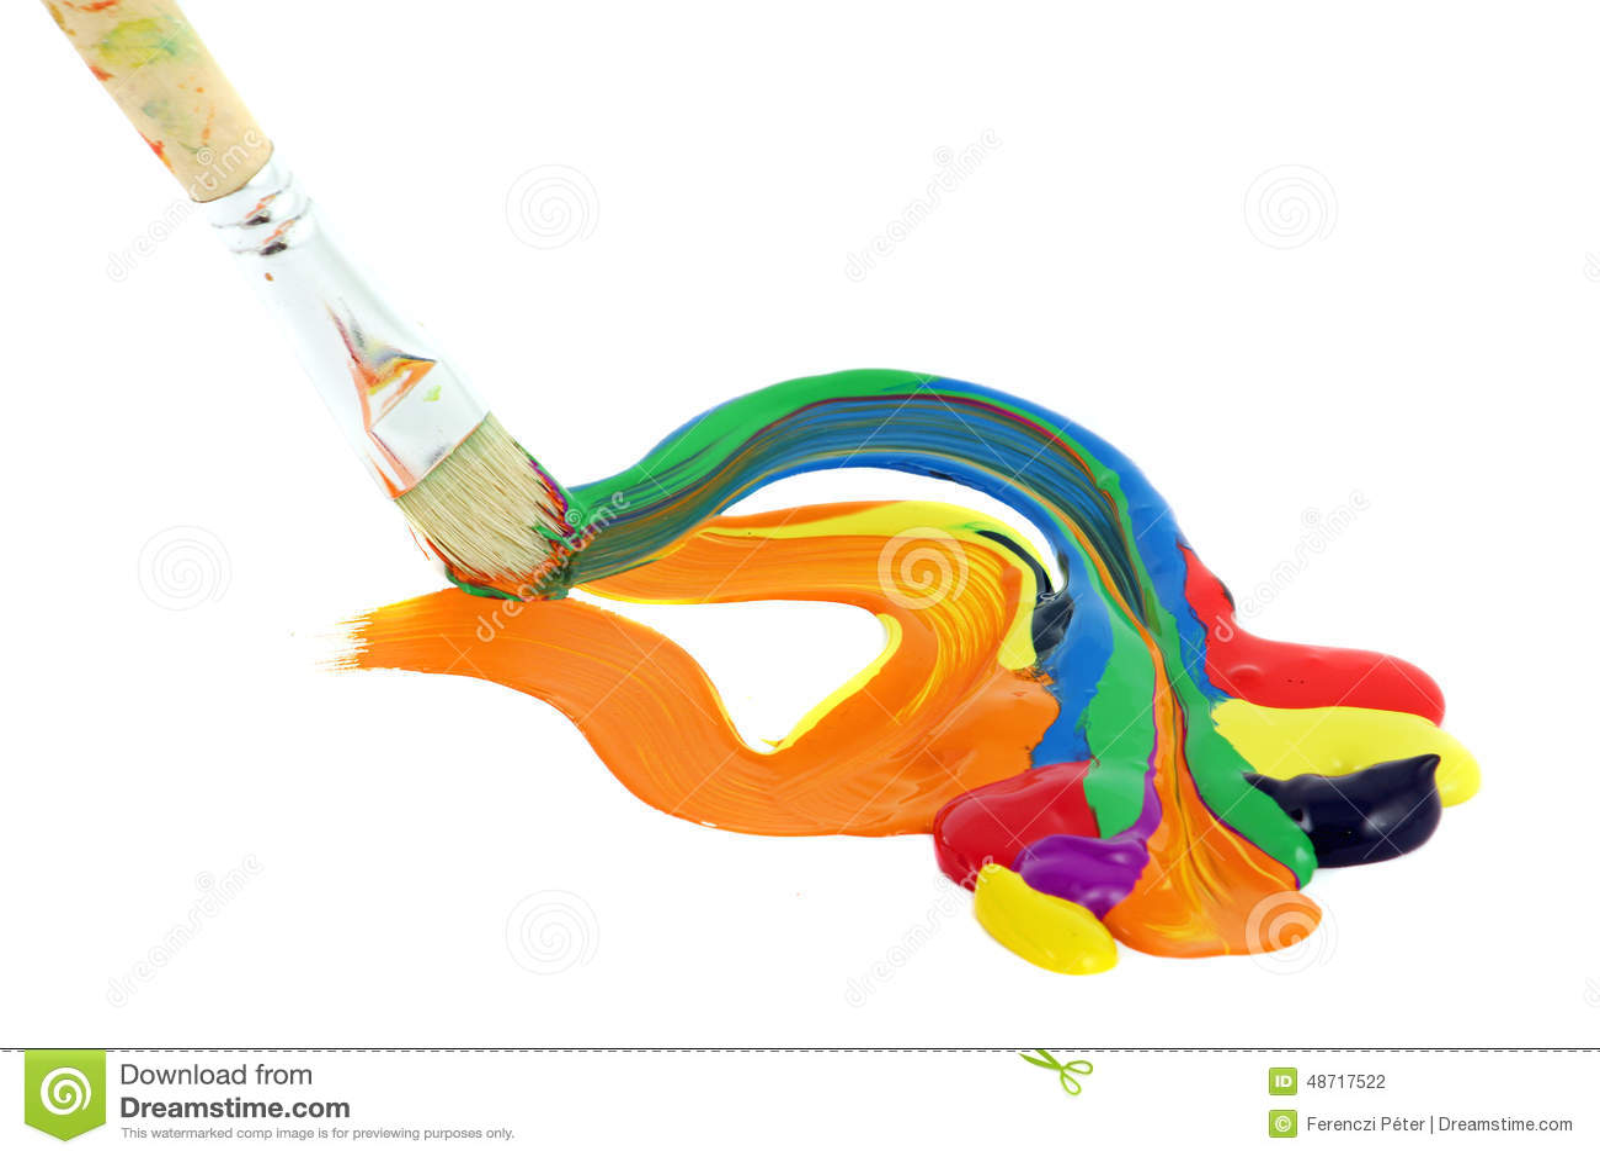 The Magic Paintbrush Movie free download HD 720p